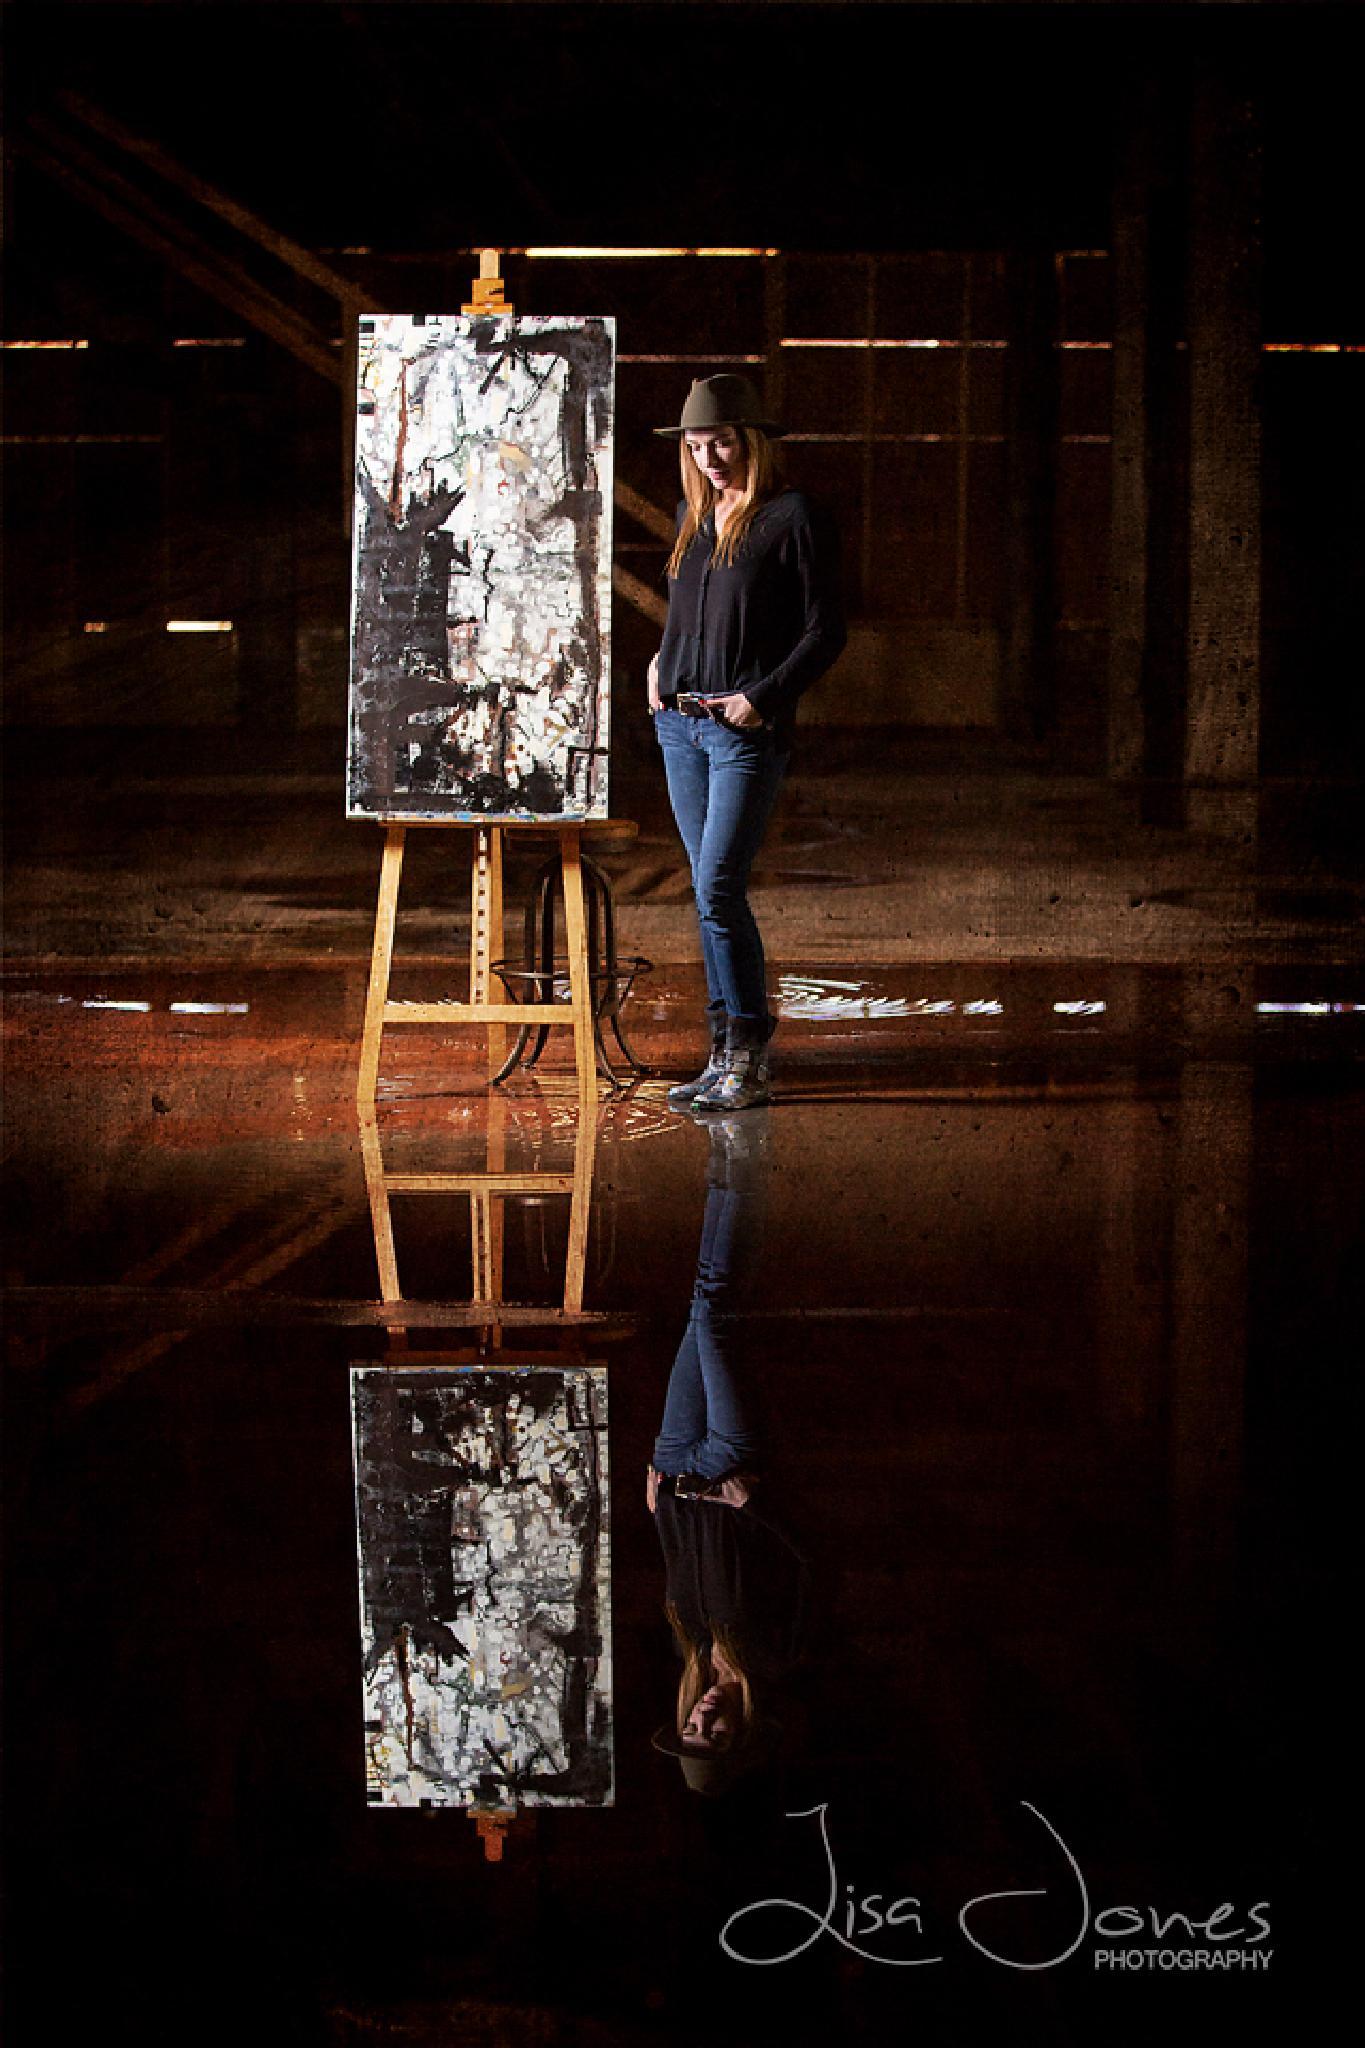 The Artist by Lisa Jones